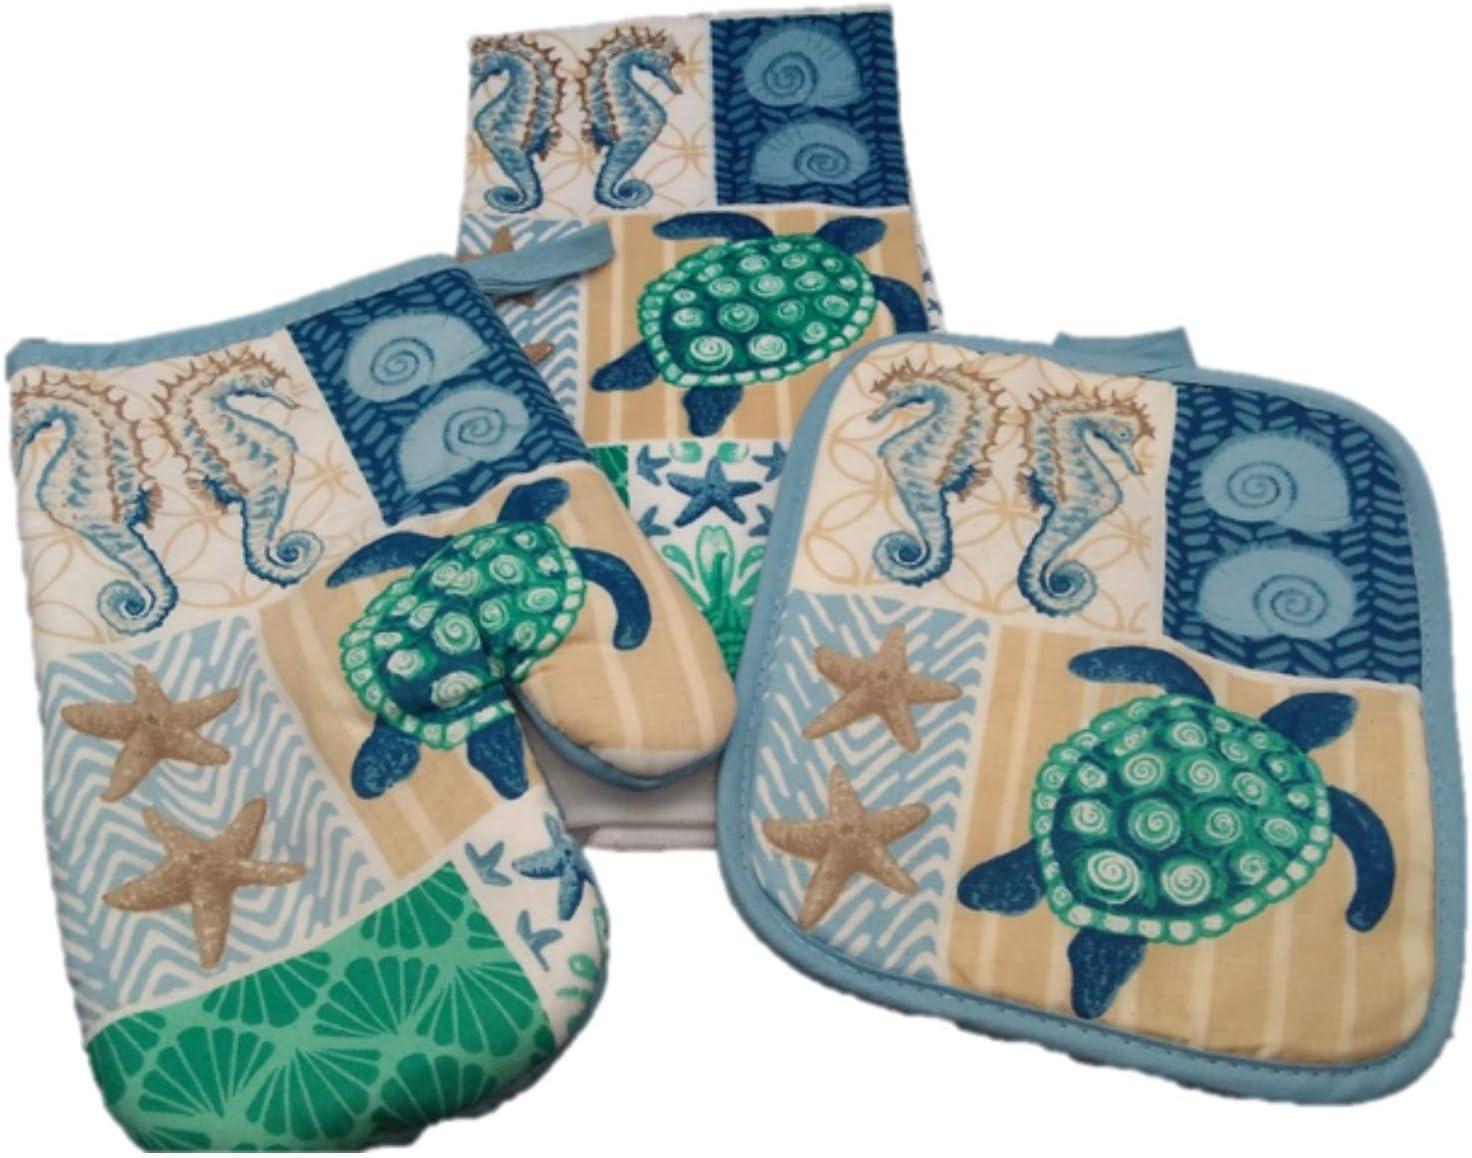 Kitchen Linens - Potholder Set (3 Pc) Sea Horse Mingles with Sea Turtles and Star Fish - Dish Towel - Oven Mitt - Pot Holder - Hand Towel - Kitchen Decor